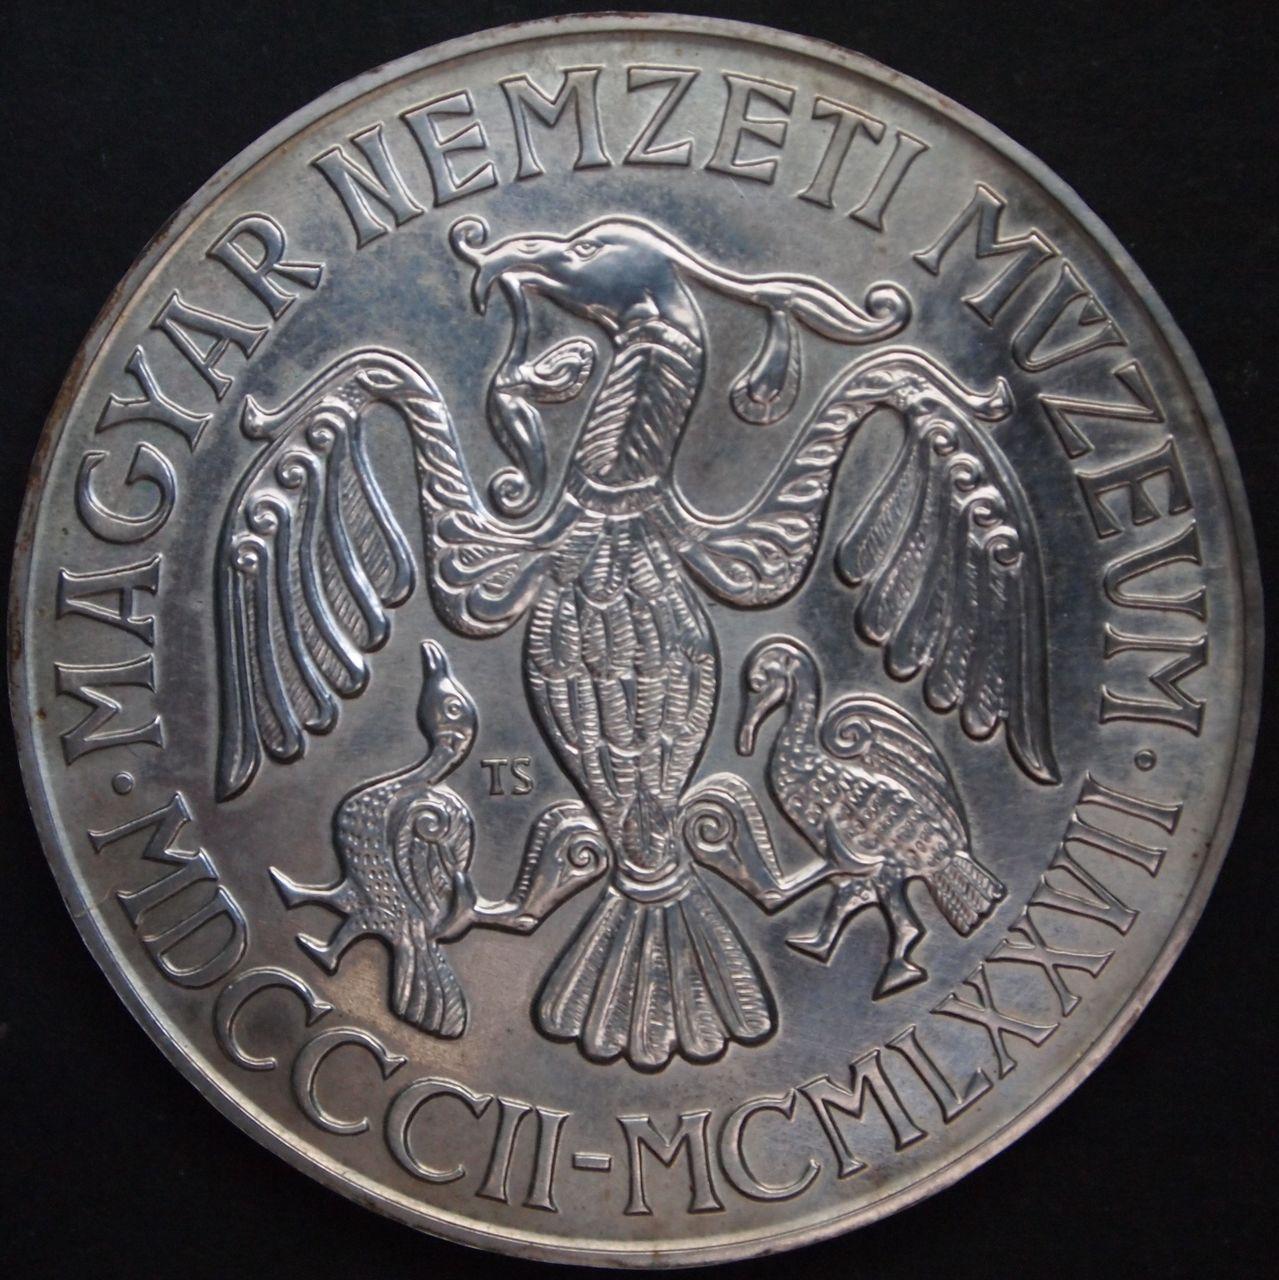 200 florines Hungria 1977 1